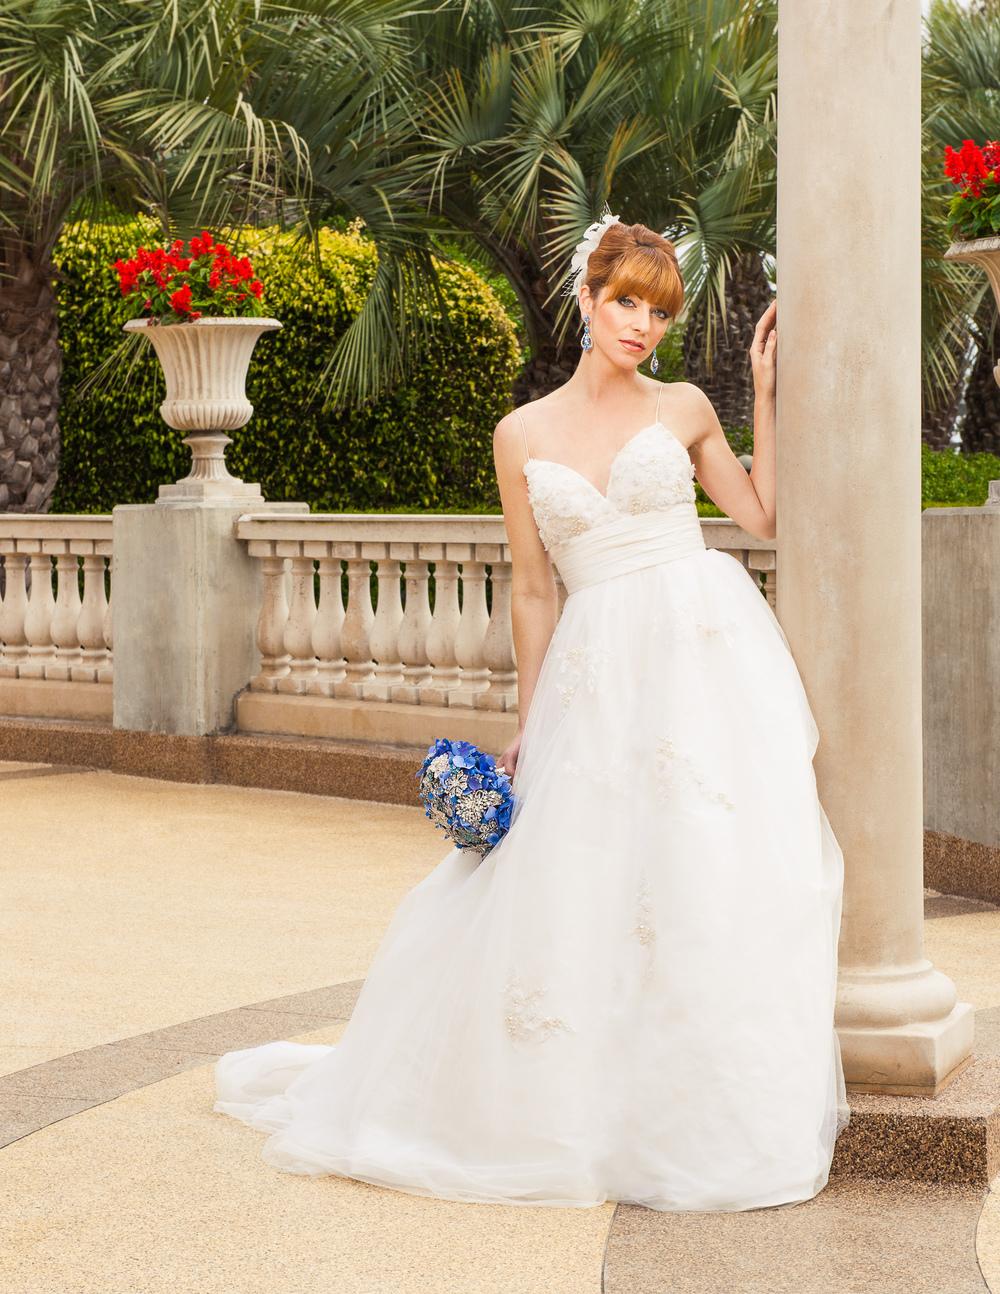 stewart_bertrand_wedding_photography_sdsw13-1007.jpg